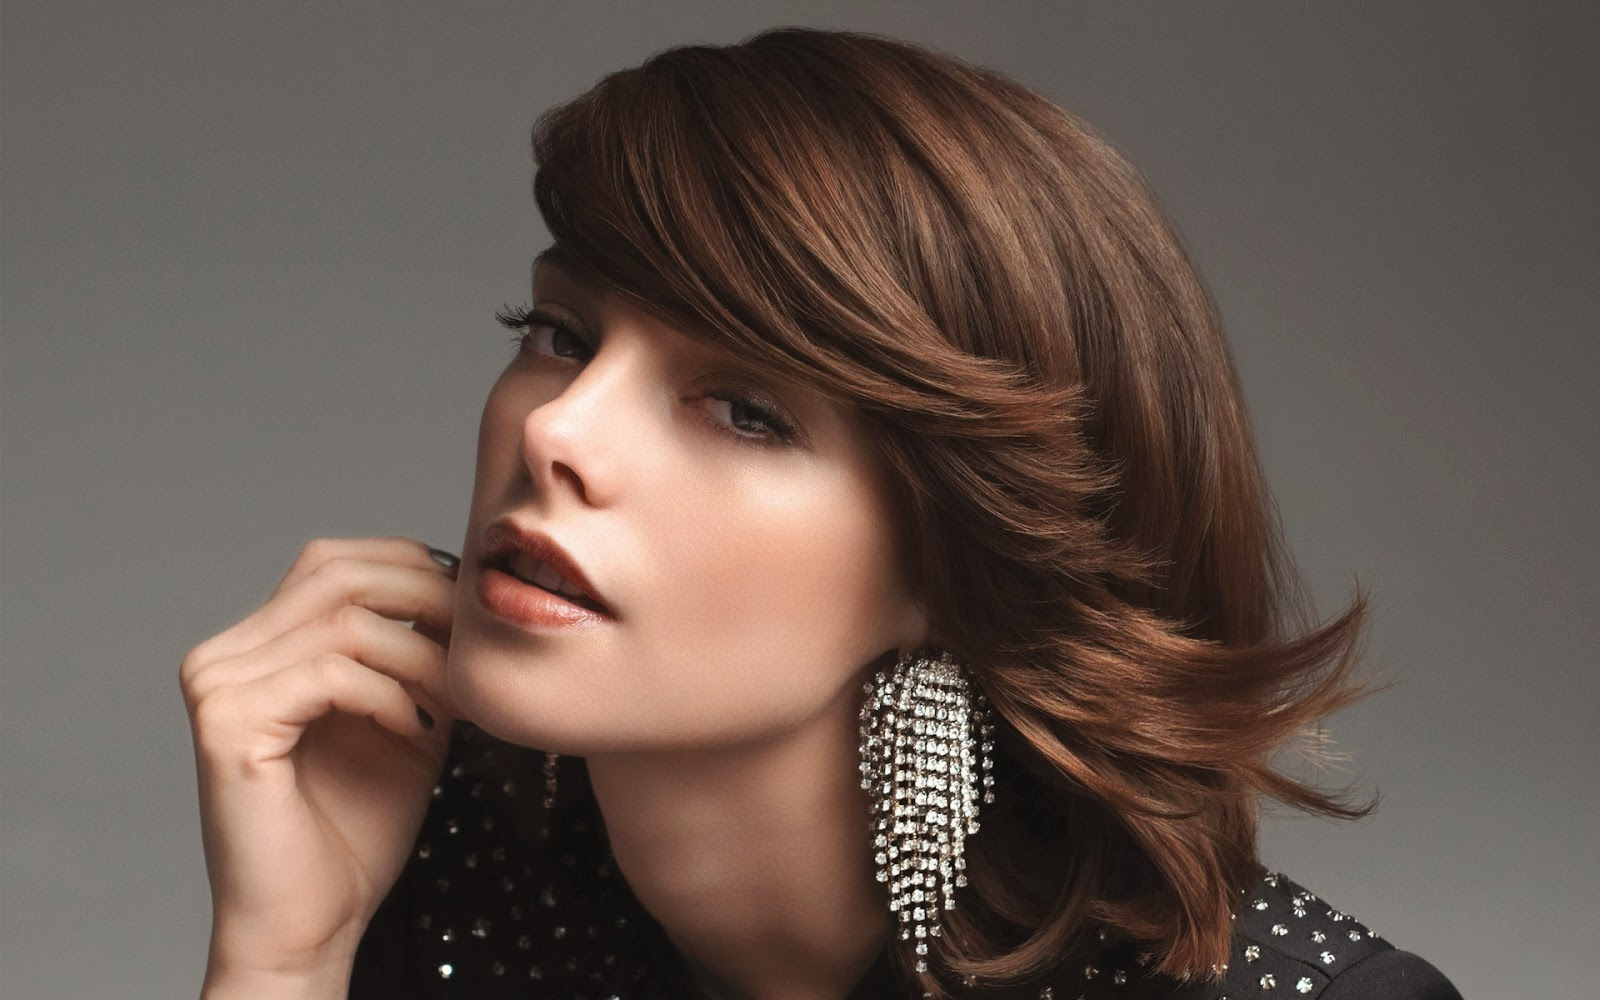 Star Celebrity Wallpapers Ashley Greene Hd Wallpapers: Star HD Wallpapers Free Download: Ashley Greene Hd